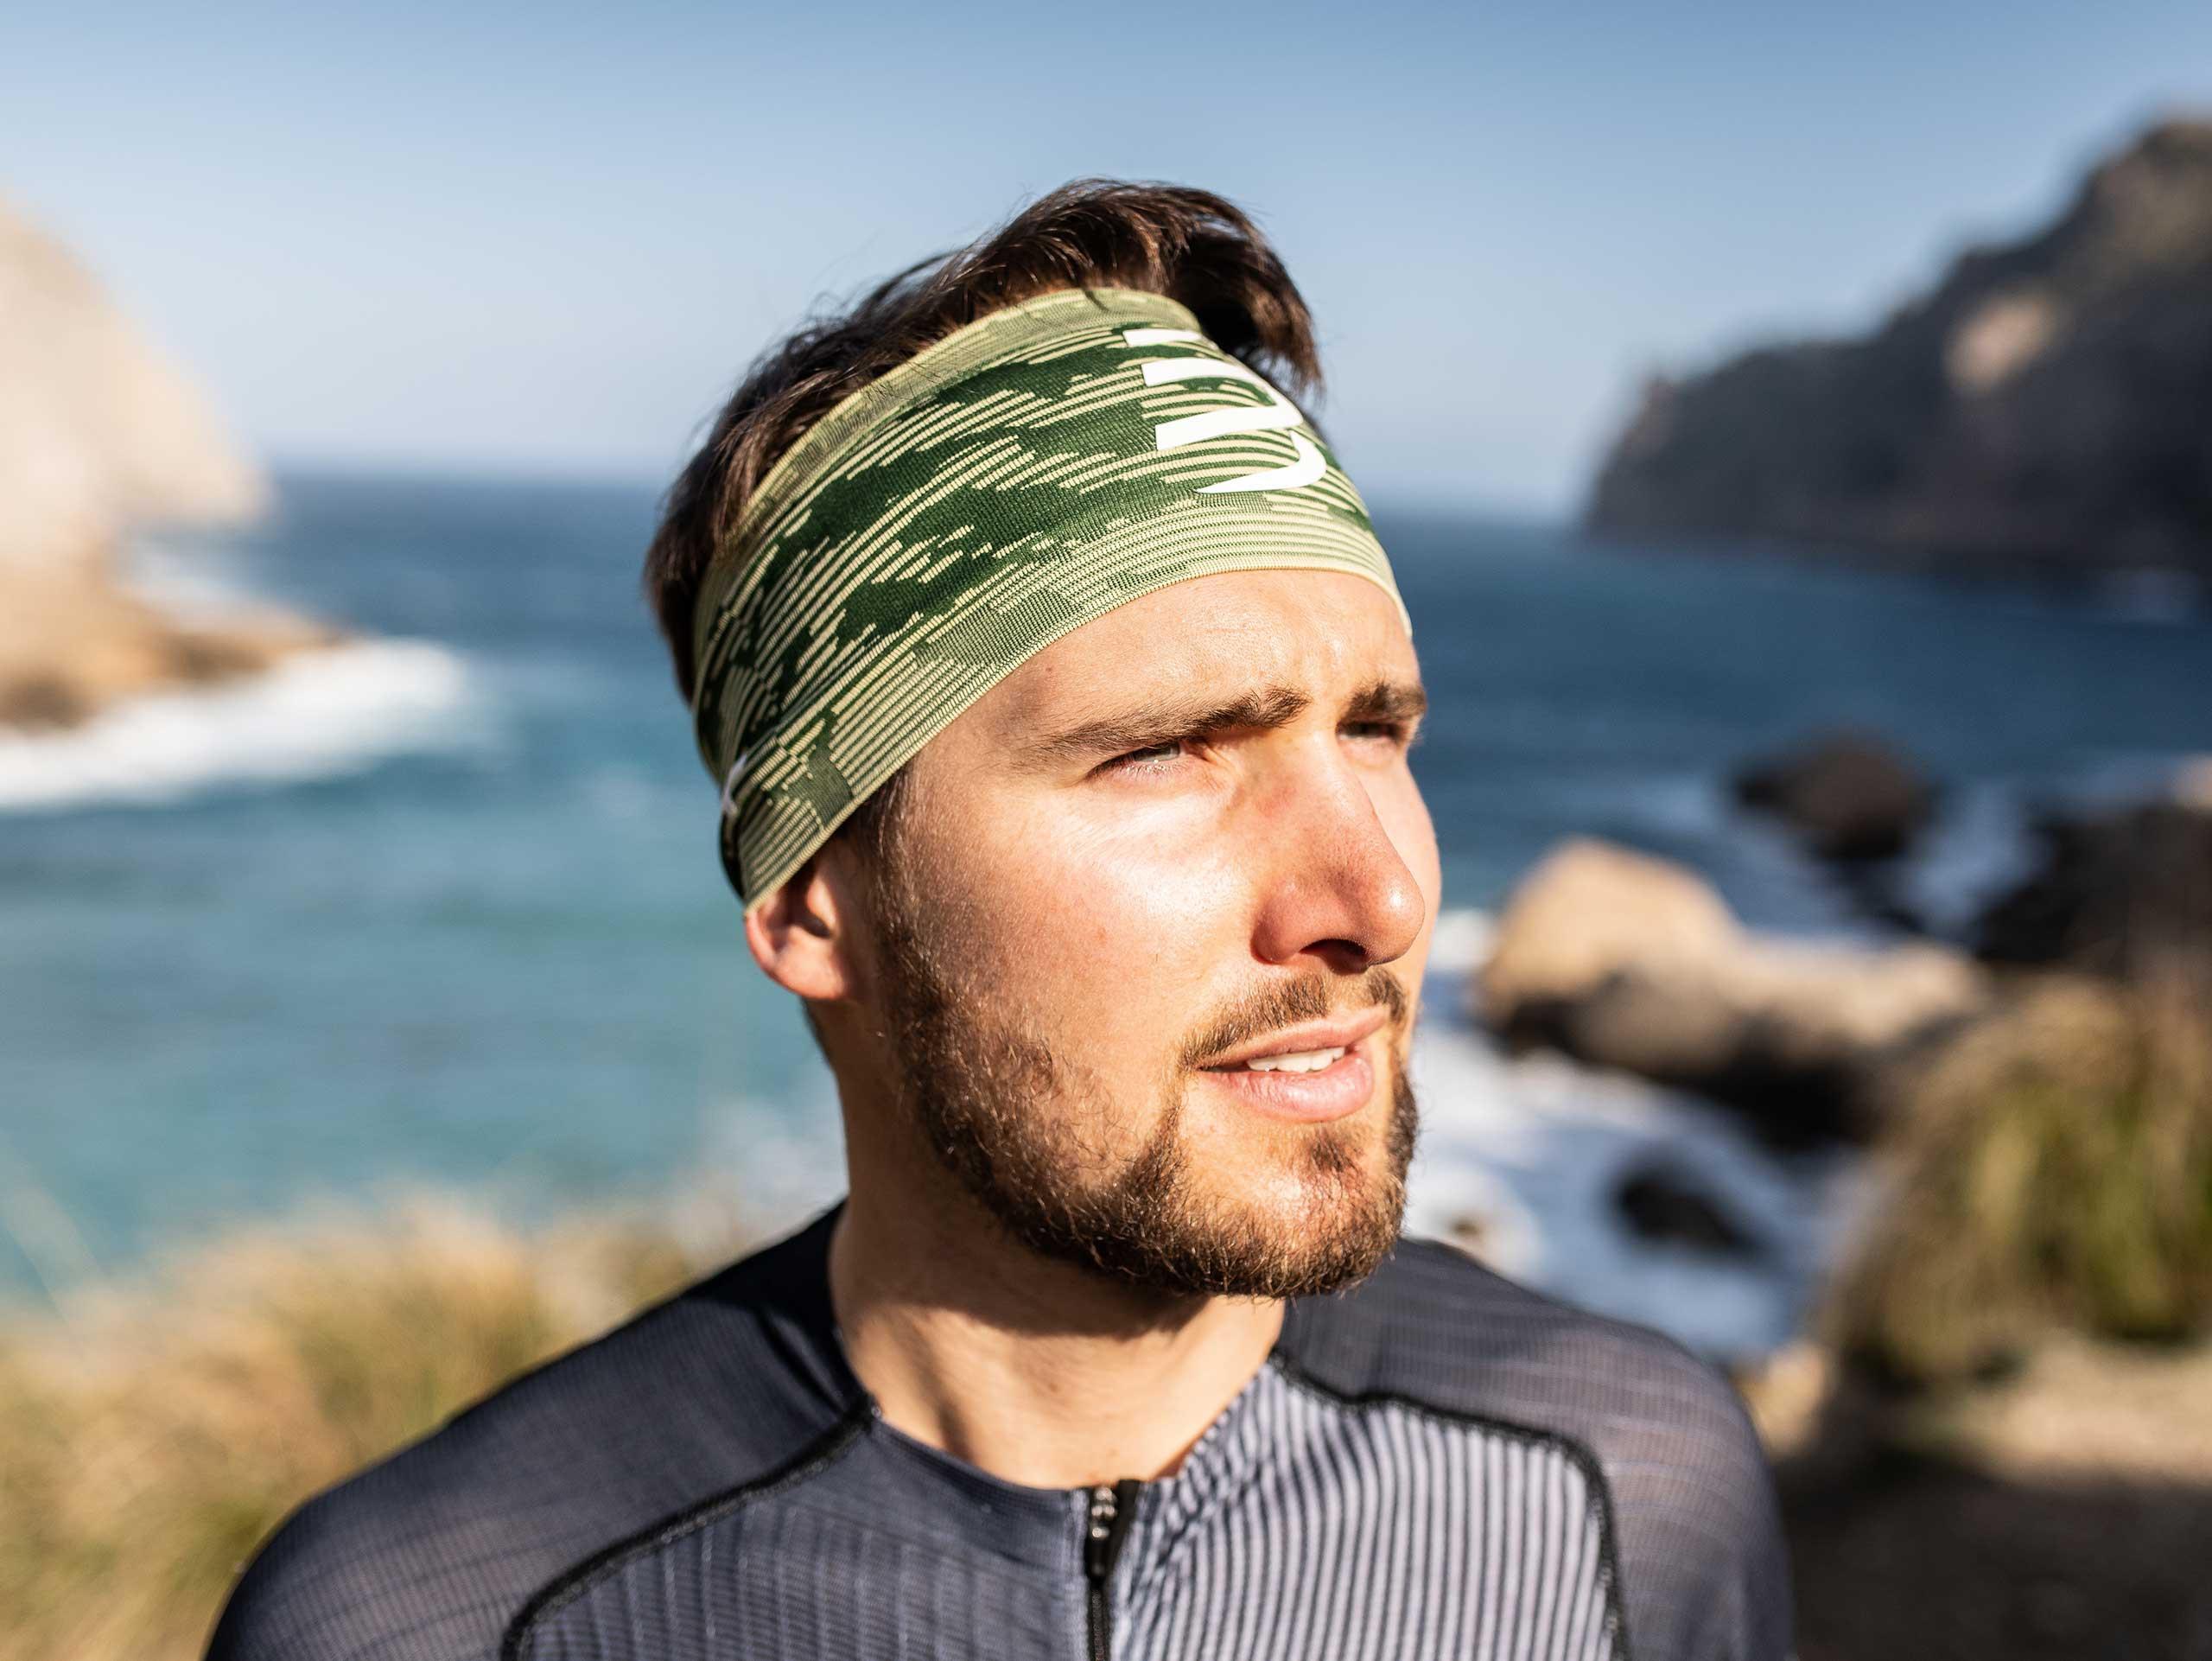 Headband On/Off camo